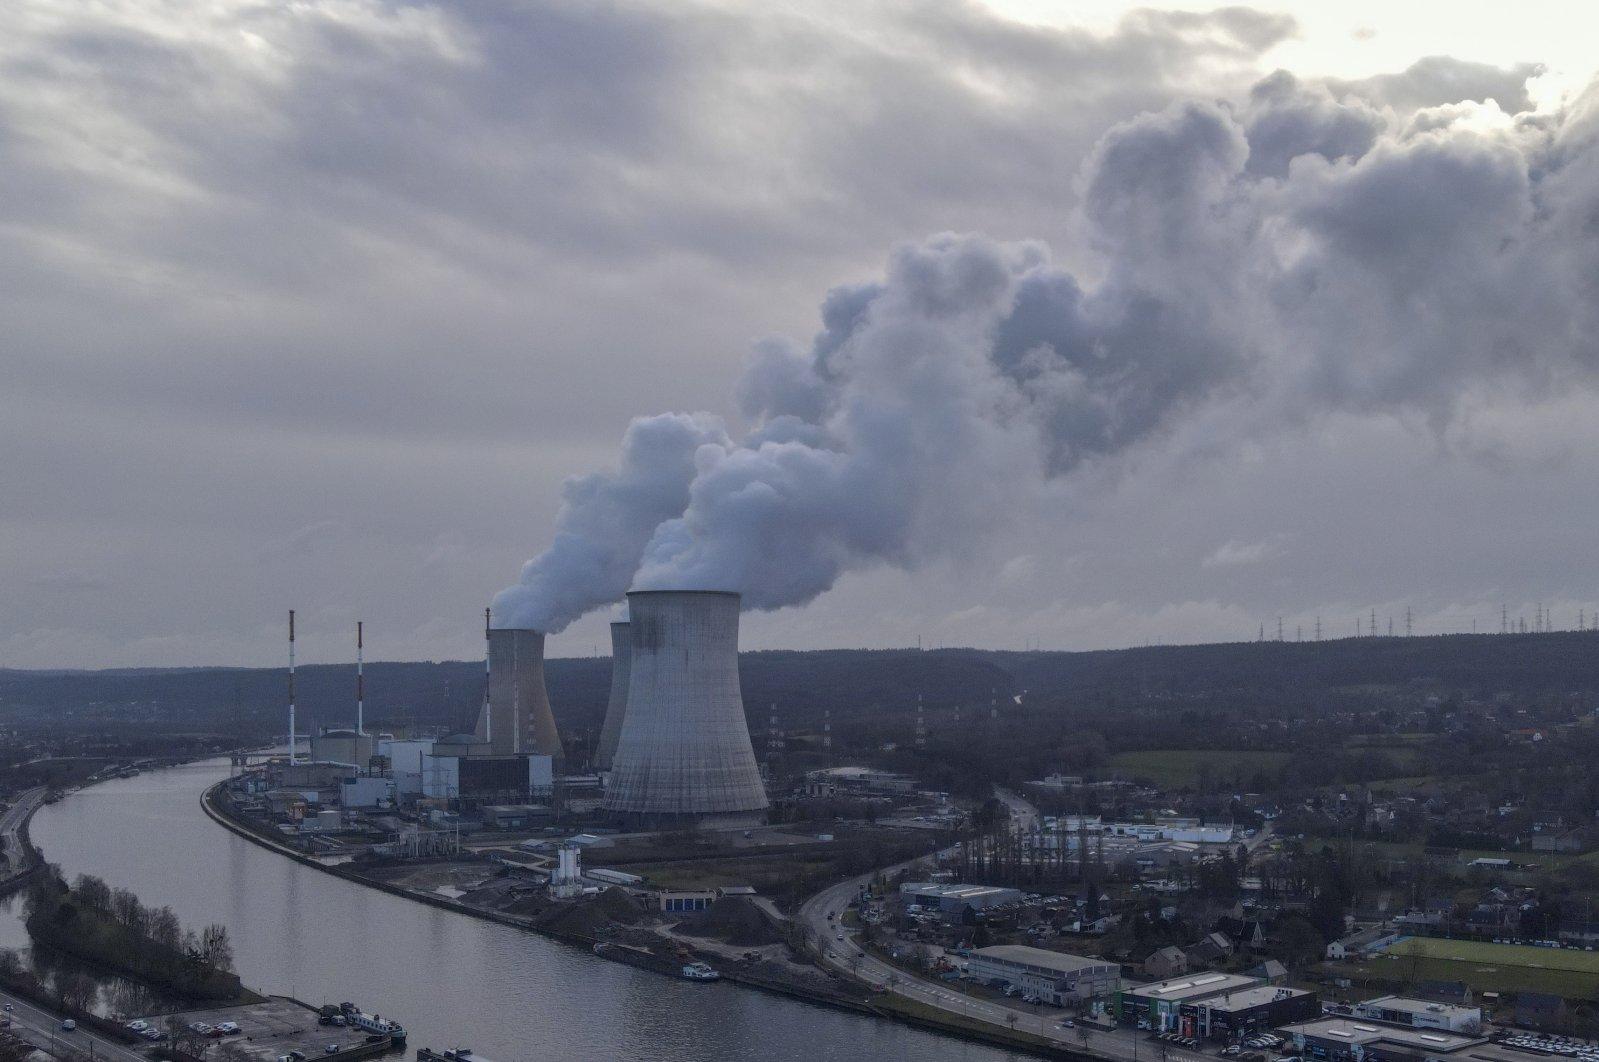 Engie nuclear power plant in Tihange, Belgium, Feb. 26, 2021. (EPA Photo)